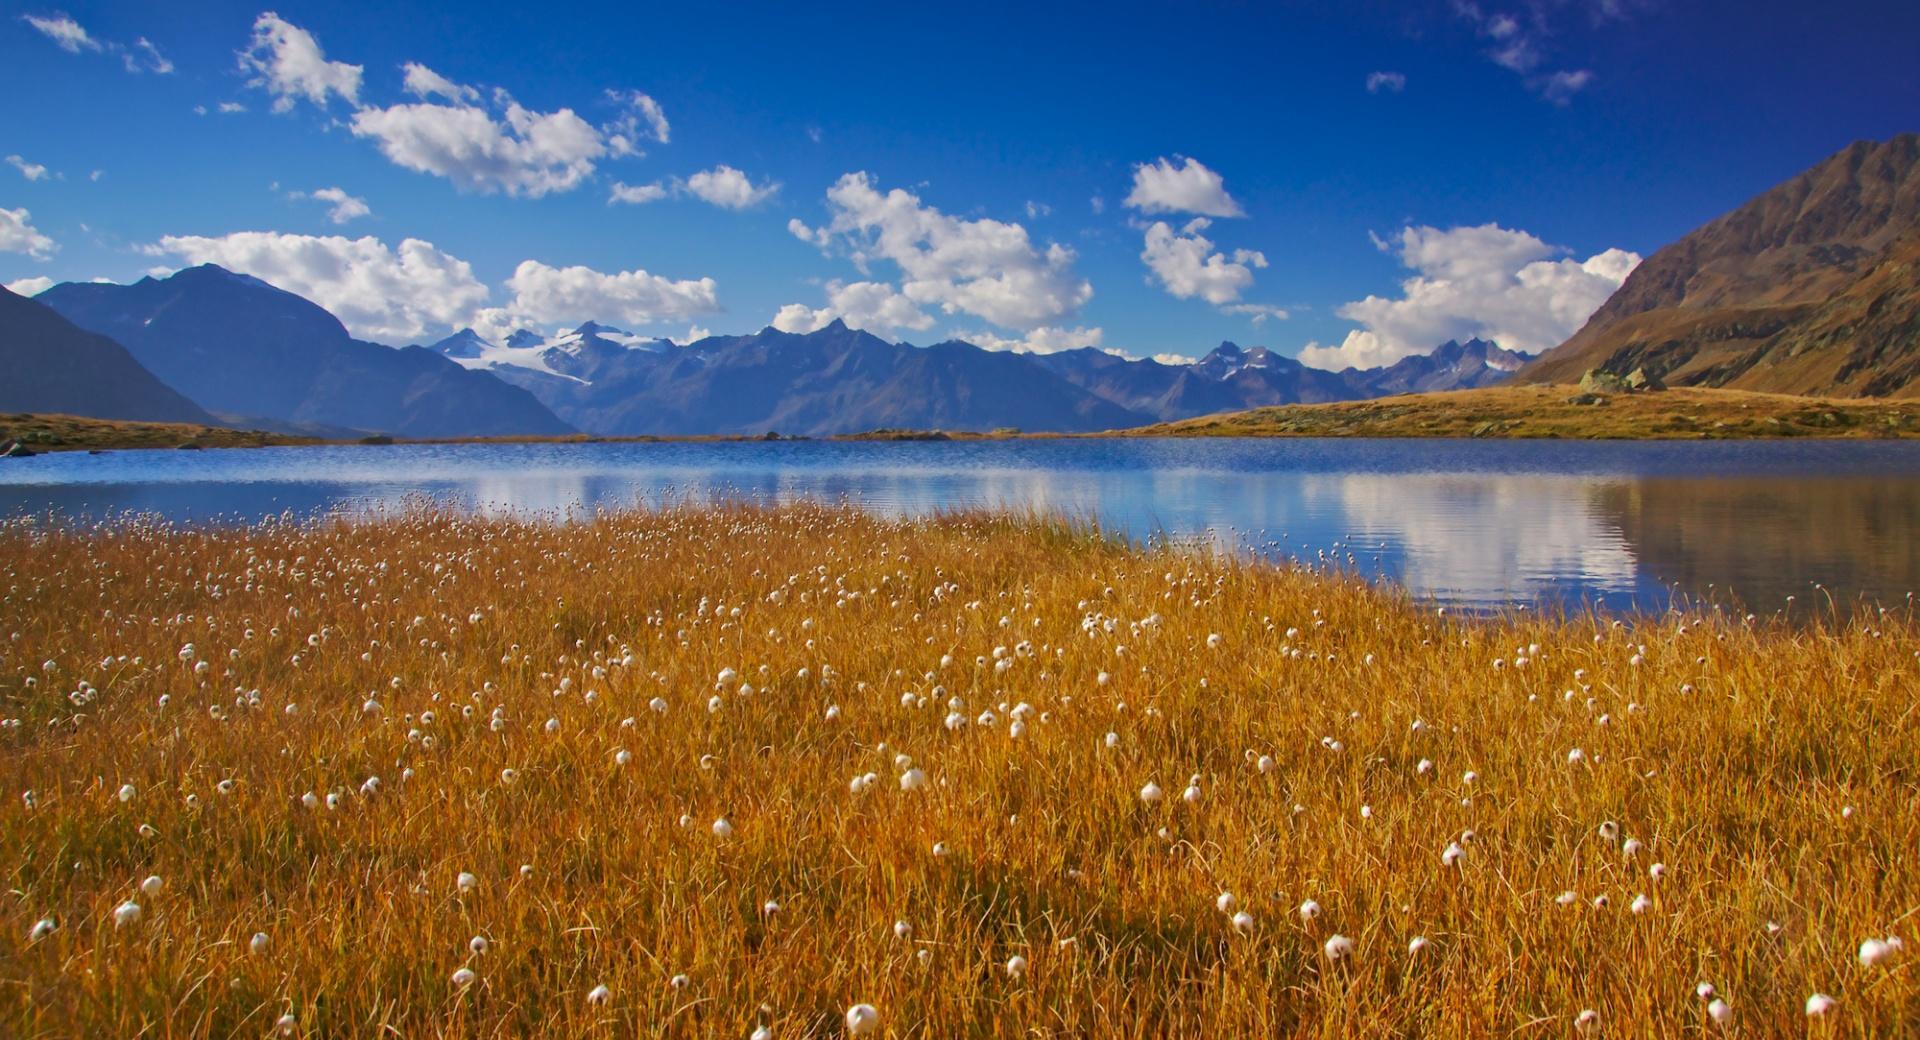 Austria Mountain Landscape wallpapers HD quality